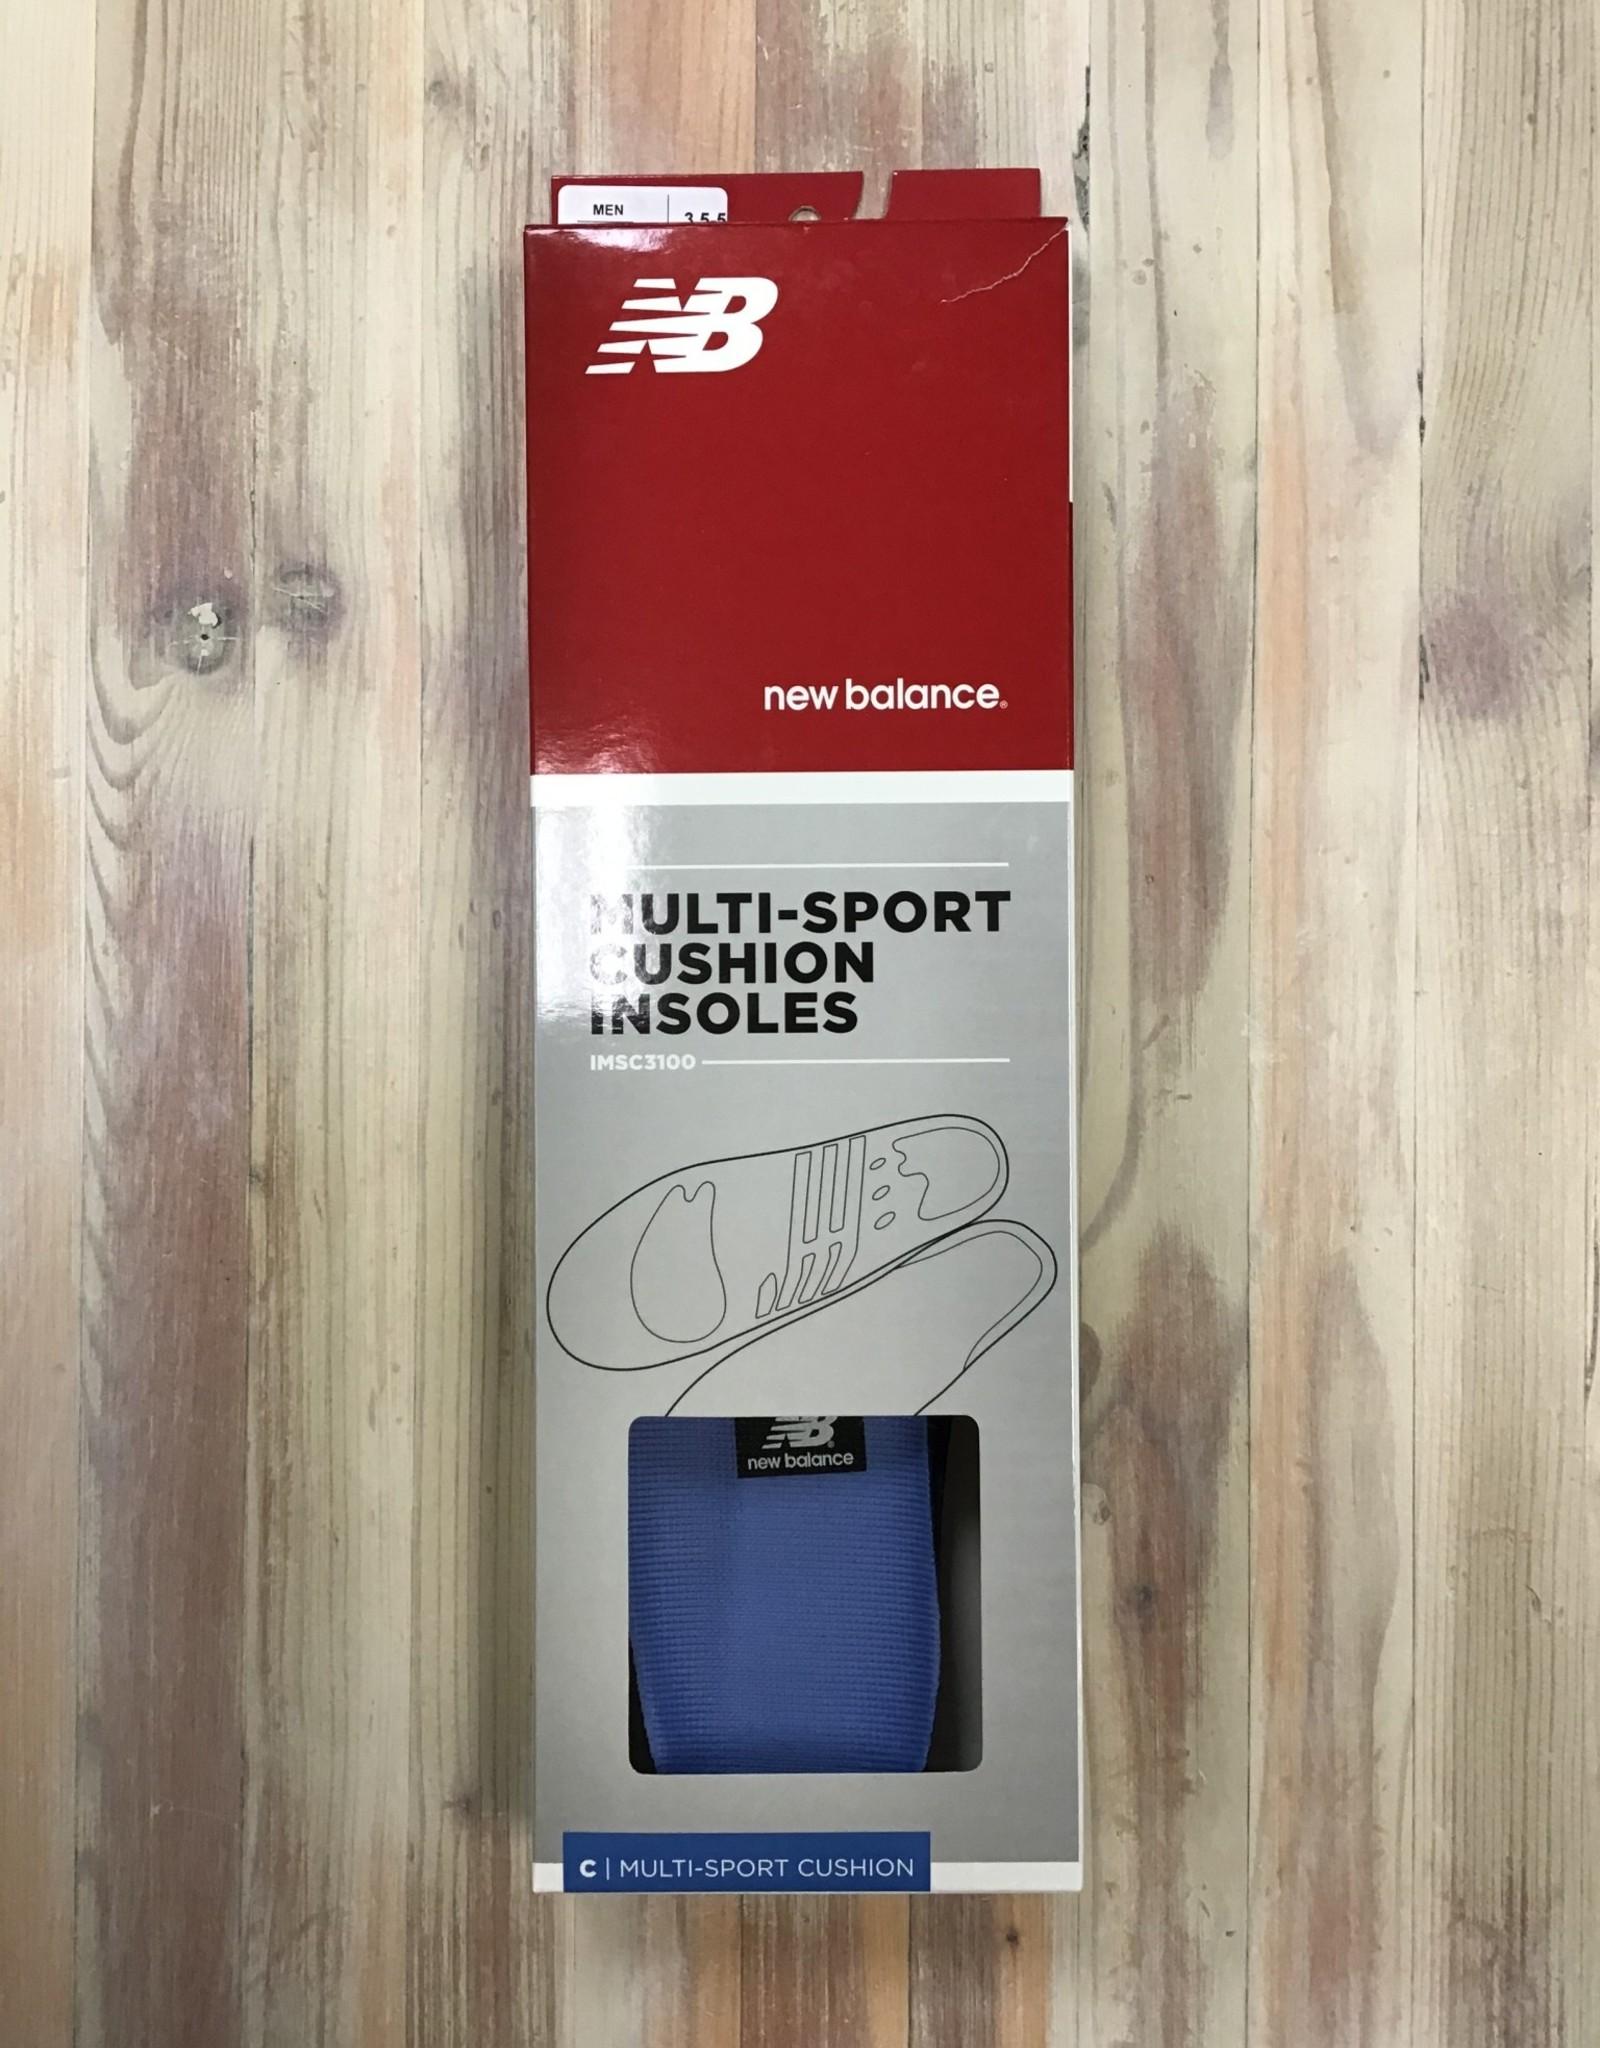 New Balance New Balance Multi-Sport Cushion 3100 Insoles Unisex